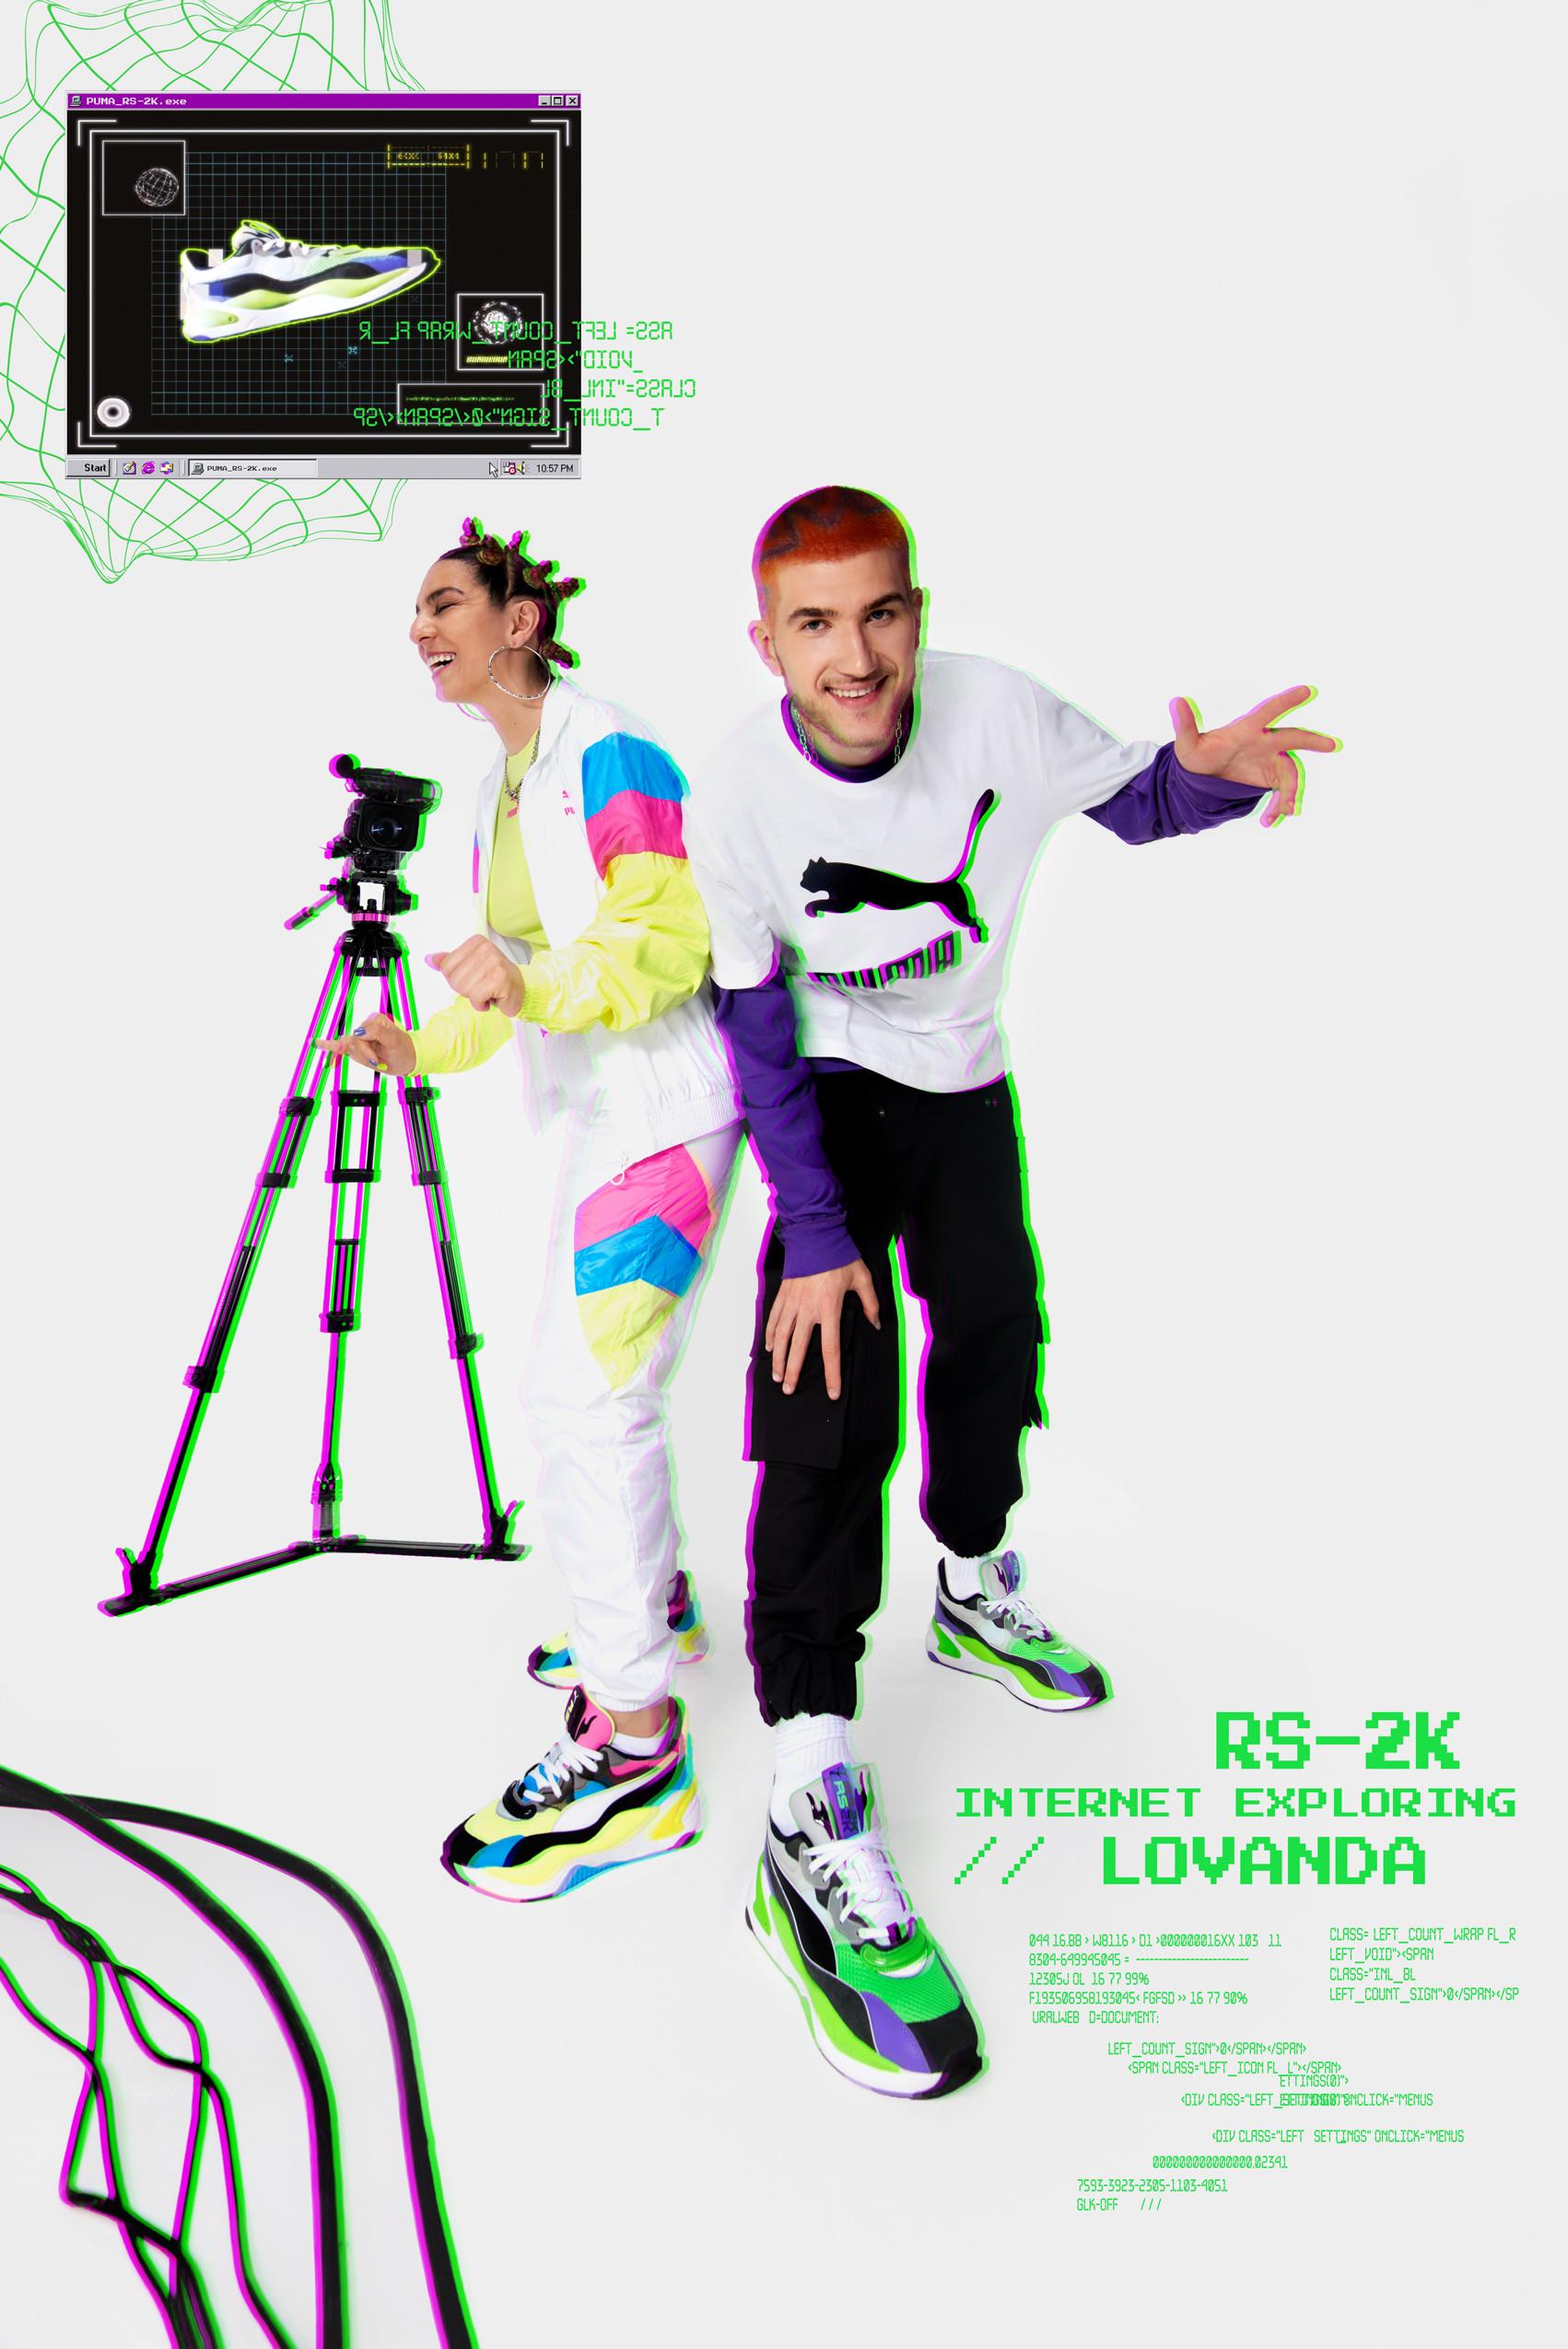 Lovanda_RS2K_1_Graphics_web.jpg